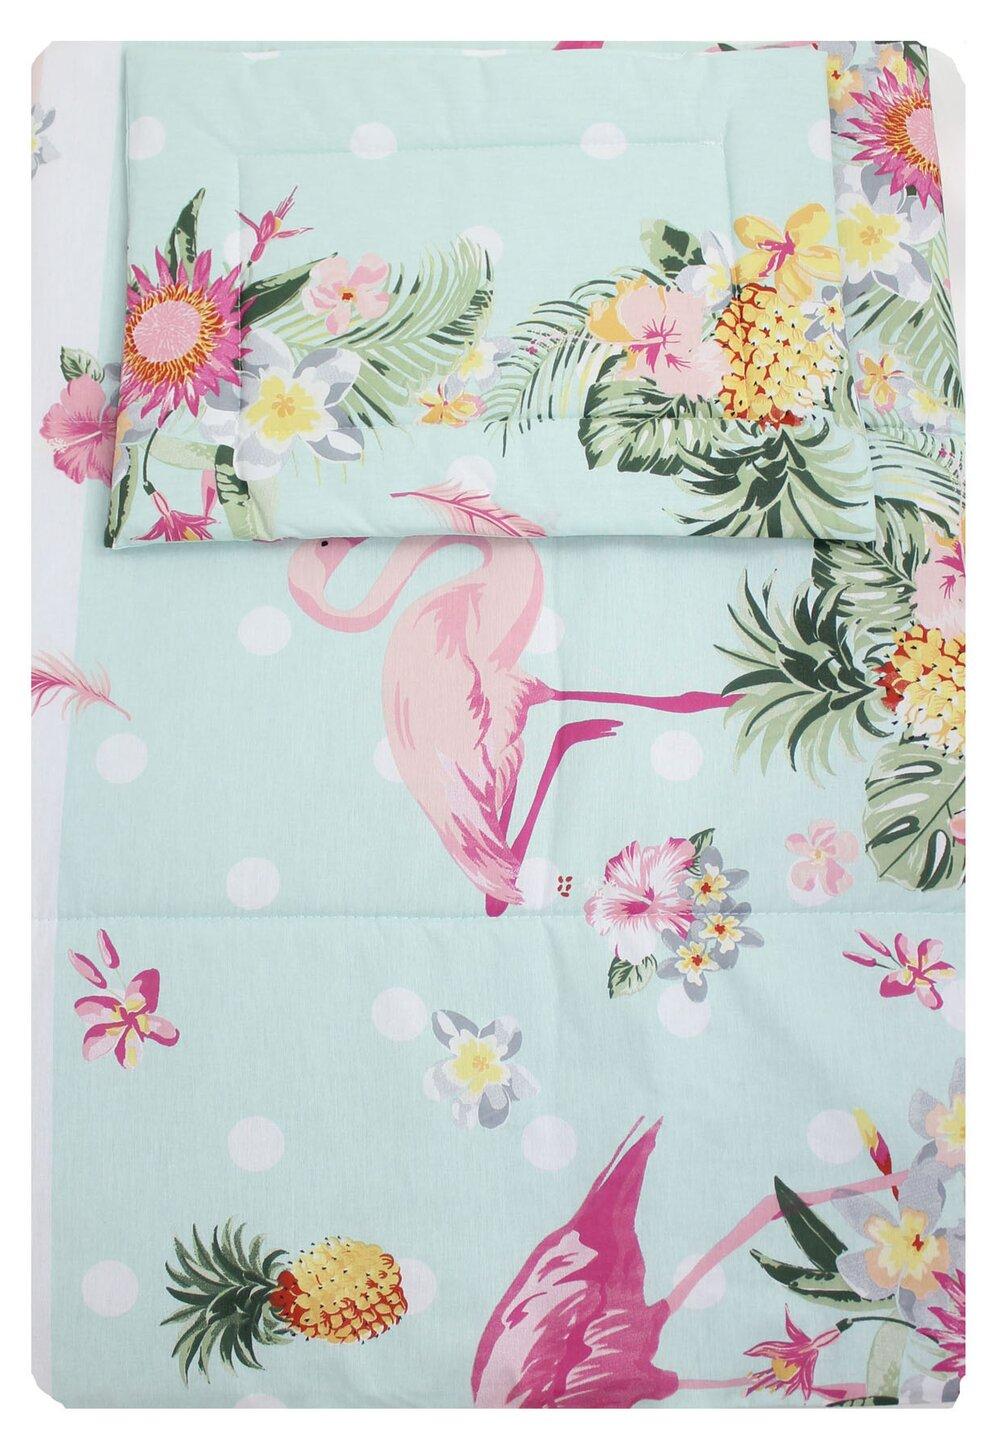 Lenjerie 3 piese, Flamingo, roz cu turcoaz, 120x60cm imagine